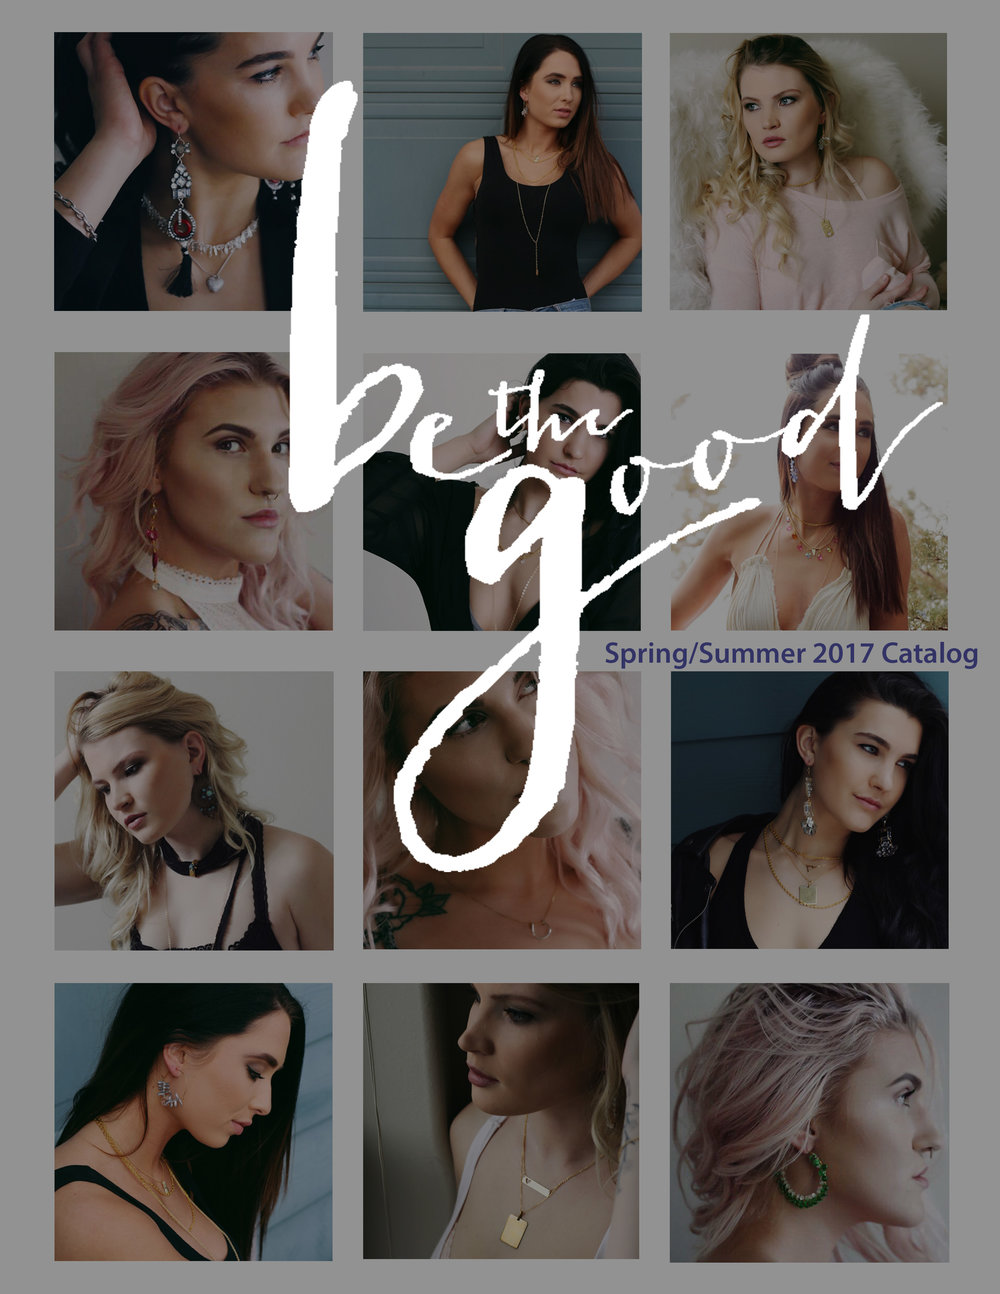 Be The Good Cover-Catalog.jpg